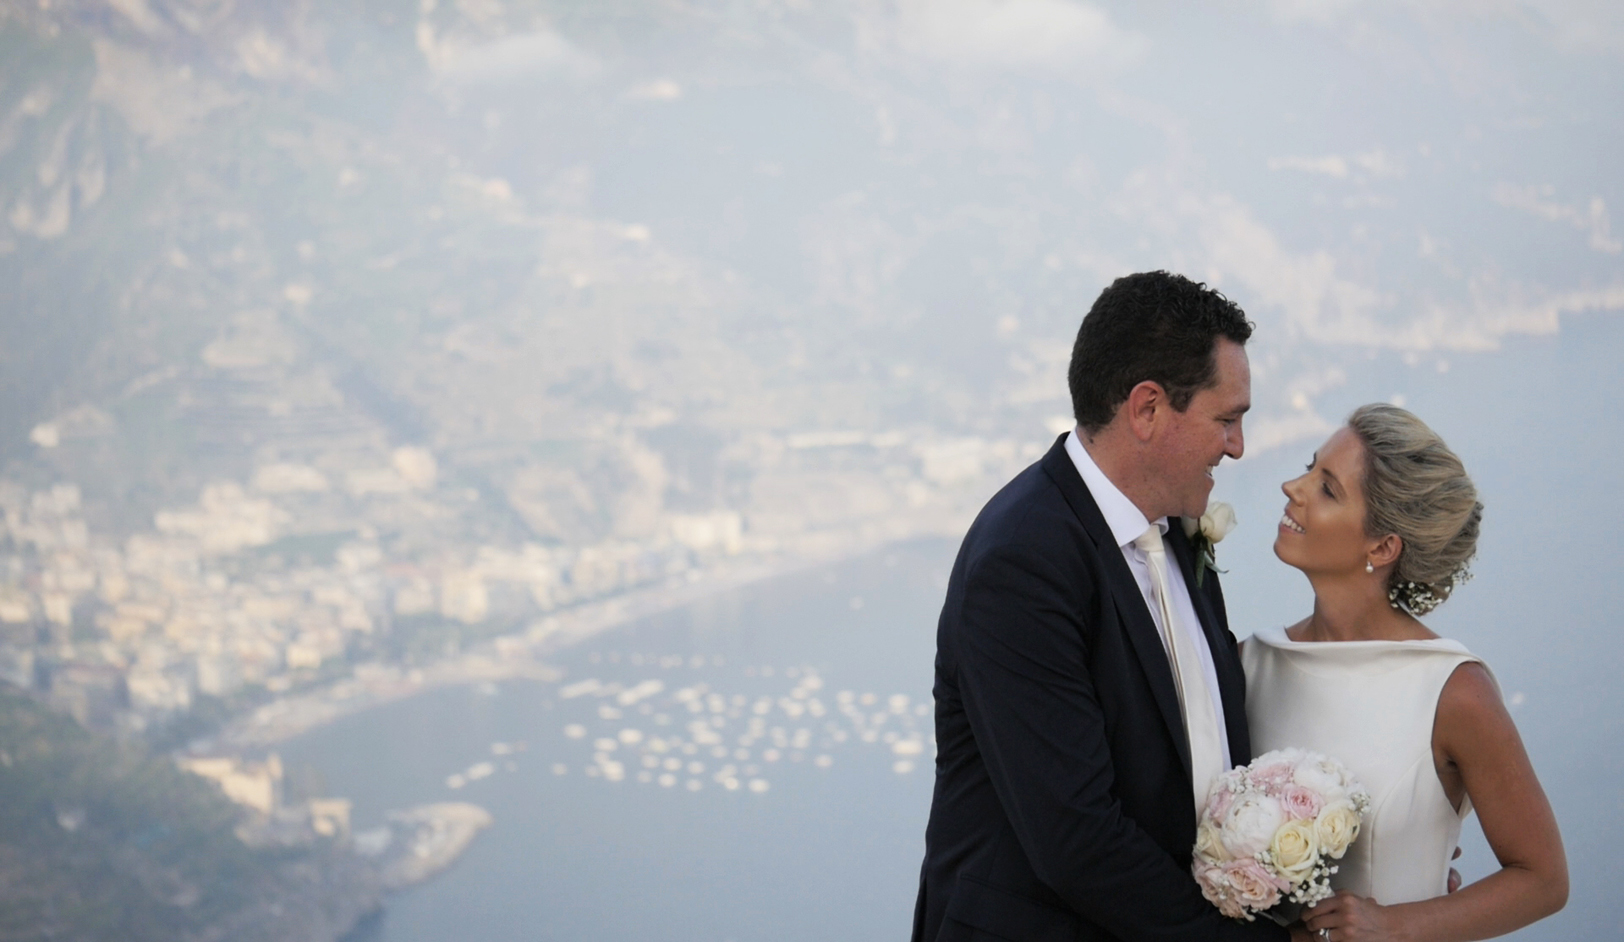 matrimonio-a-ravello-villa-eva-amalfi-italia.jpg